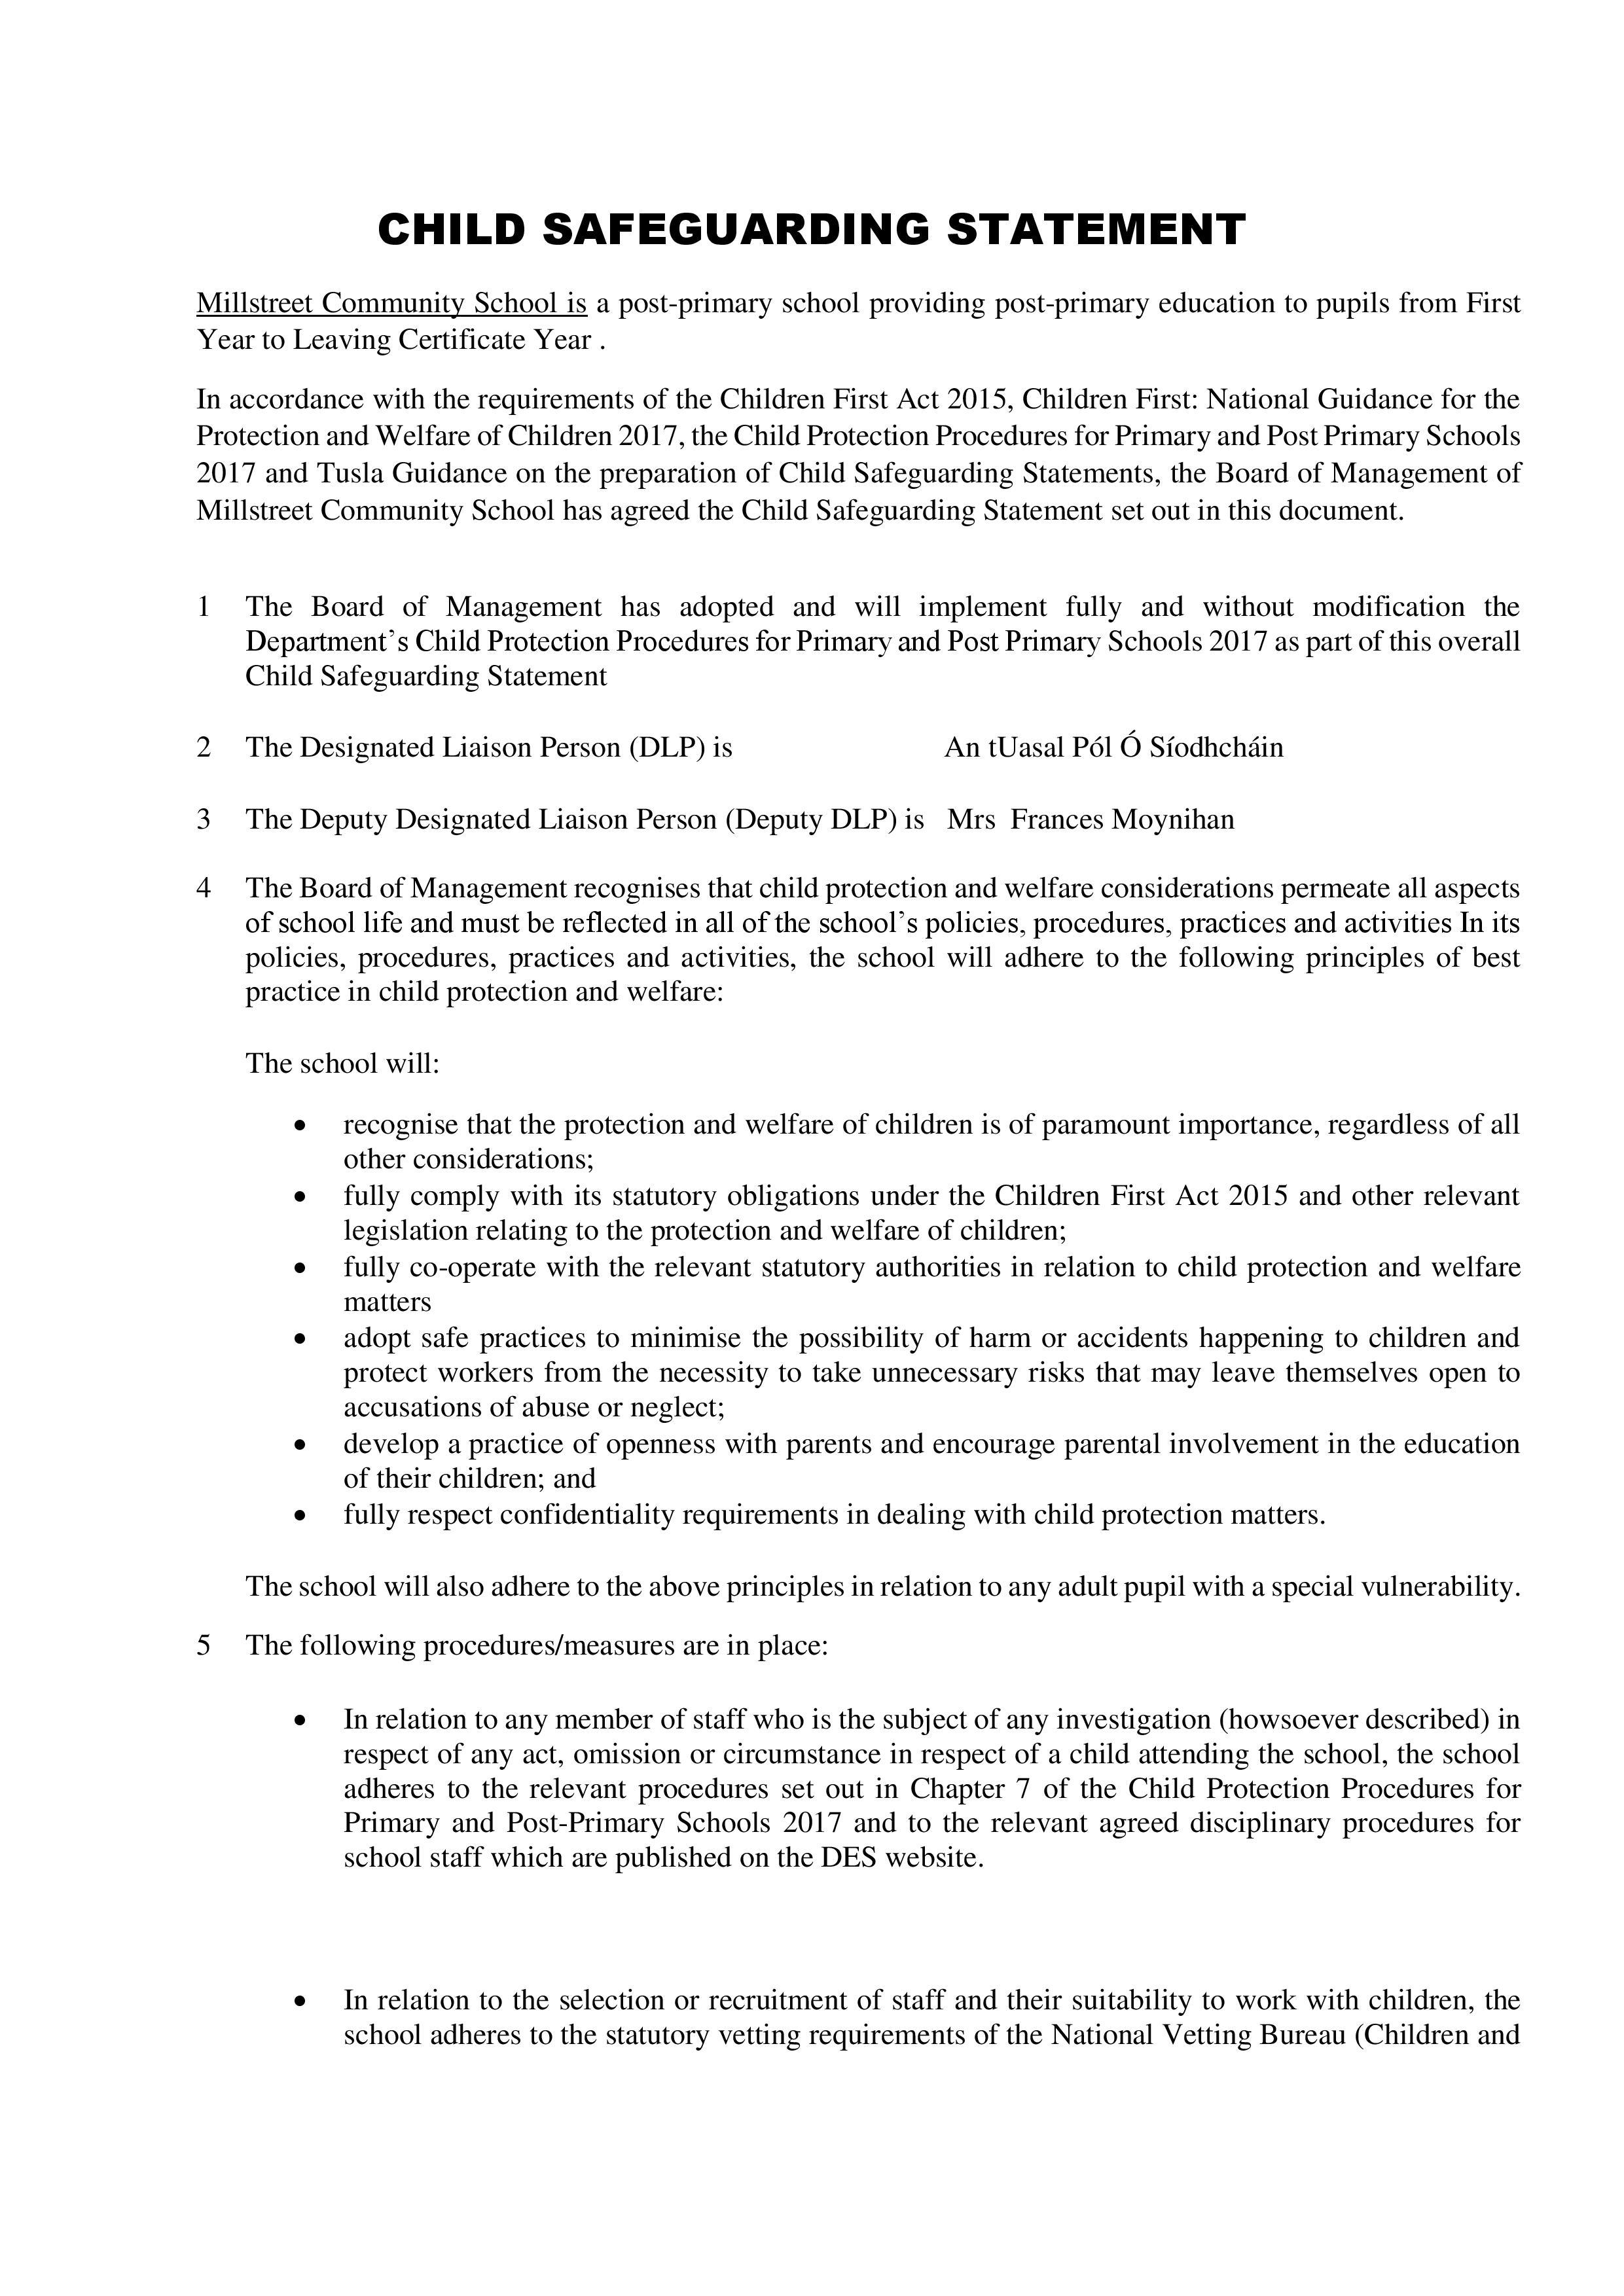 Child Safeguarding Statement-page-001.jpg